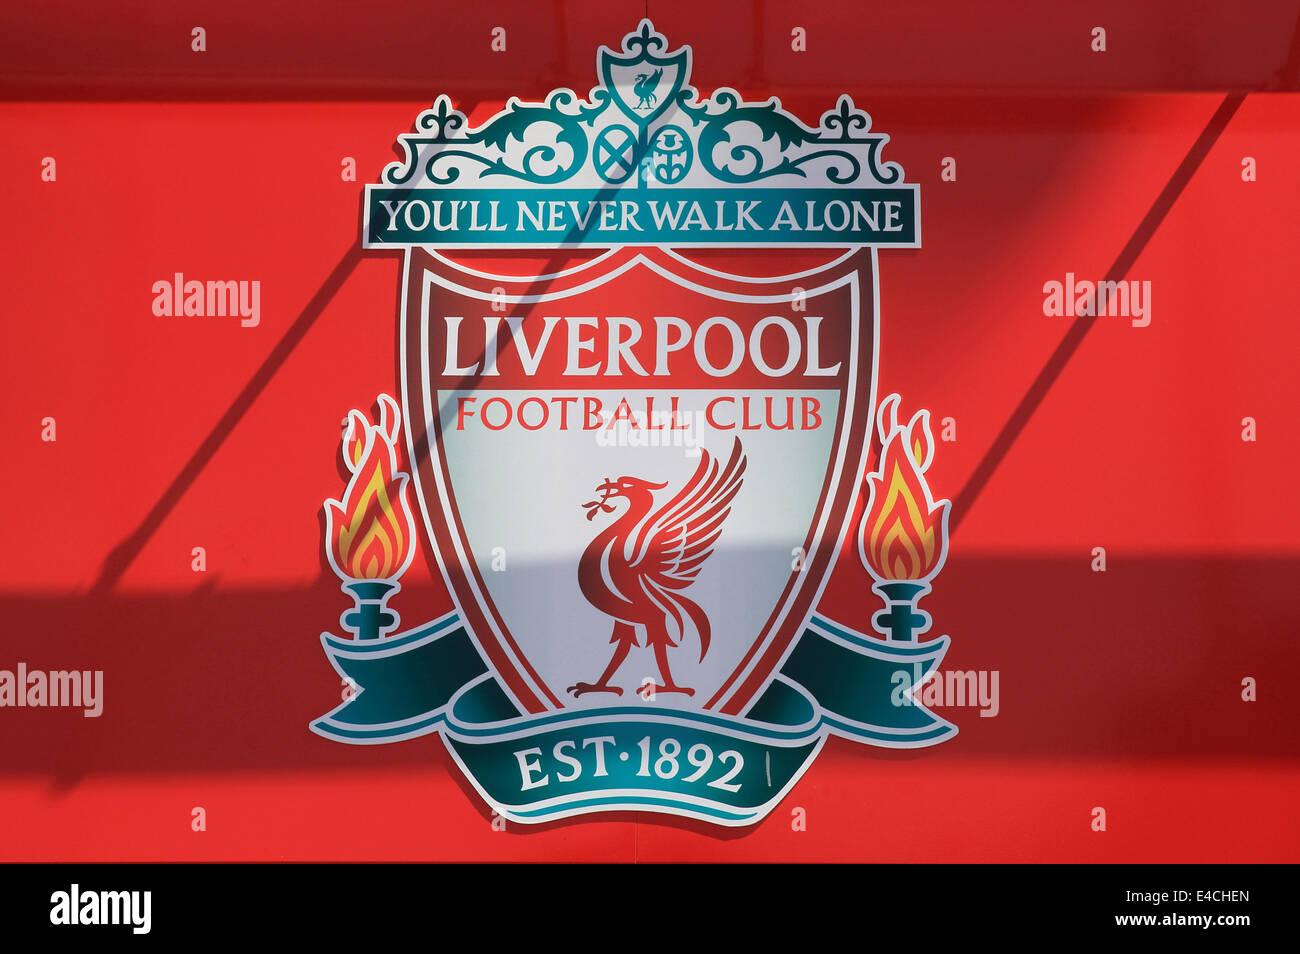 65cacbf2c The Liverpool football club emblem